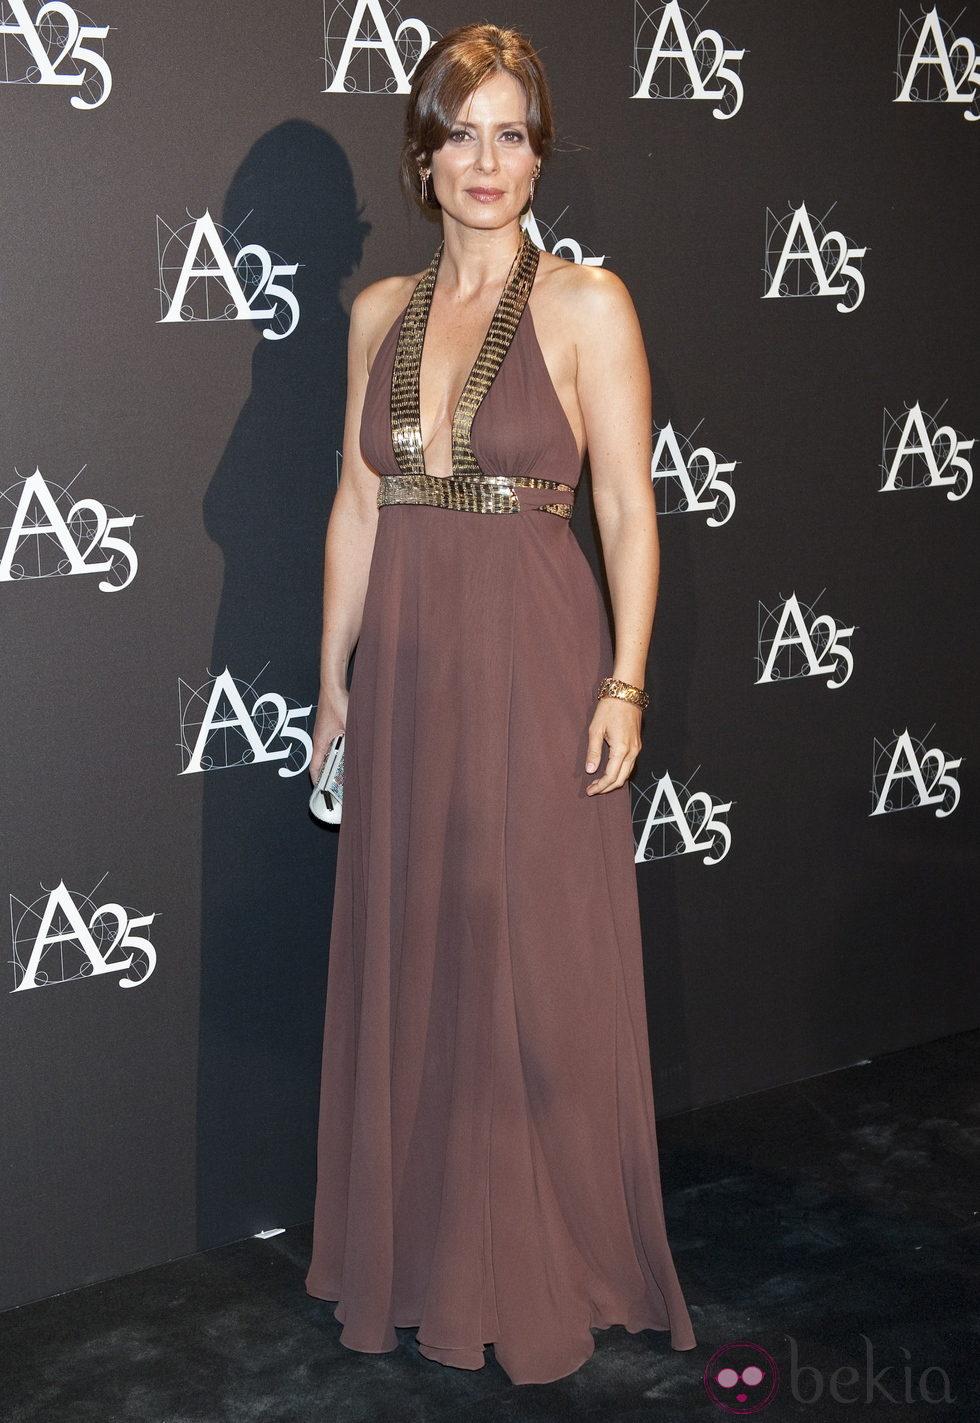 Aitana Sánchez Gijón durante un acto de la Academia de Cine